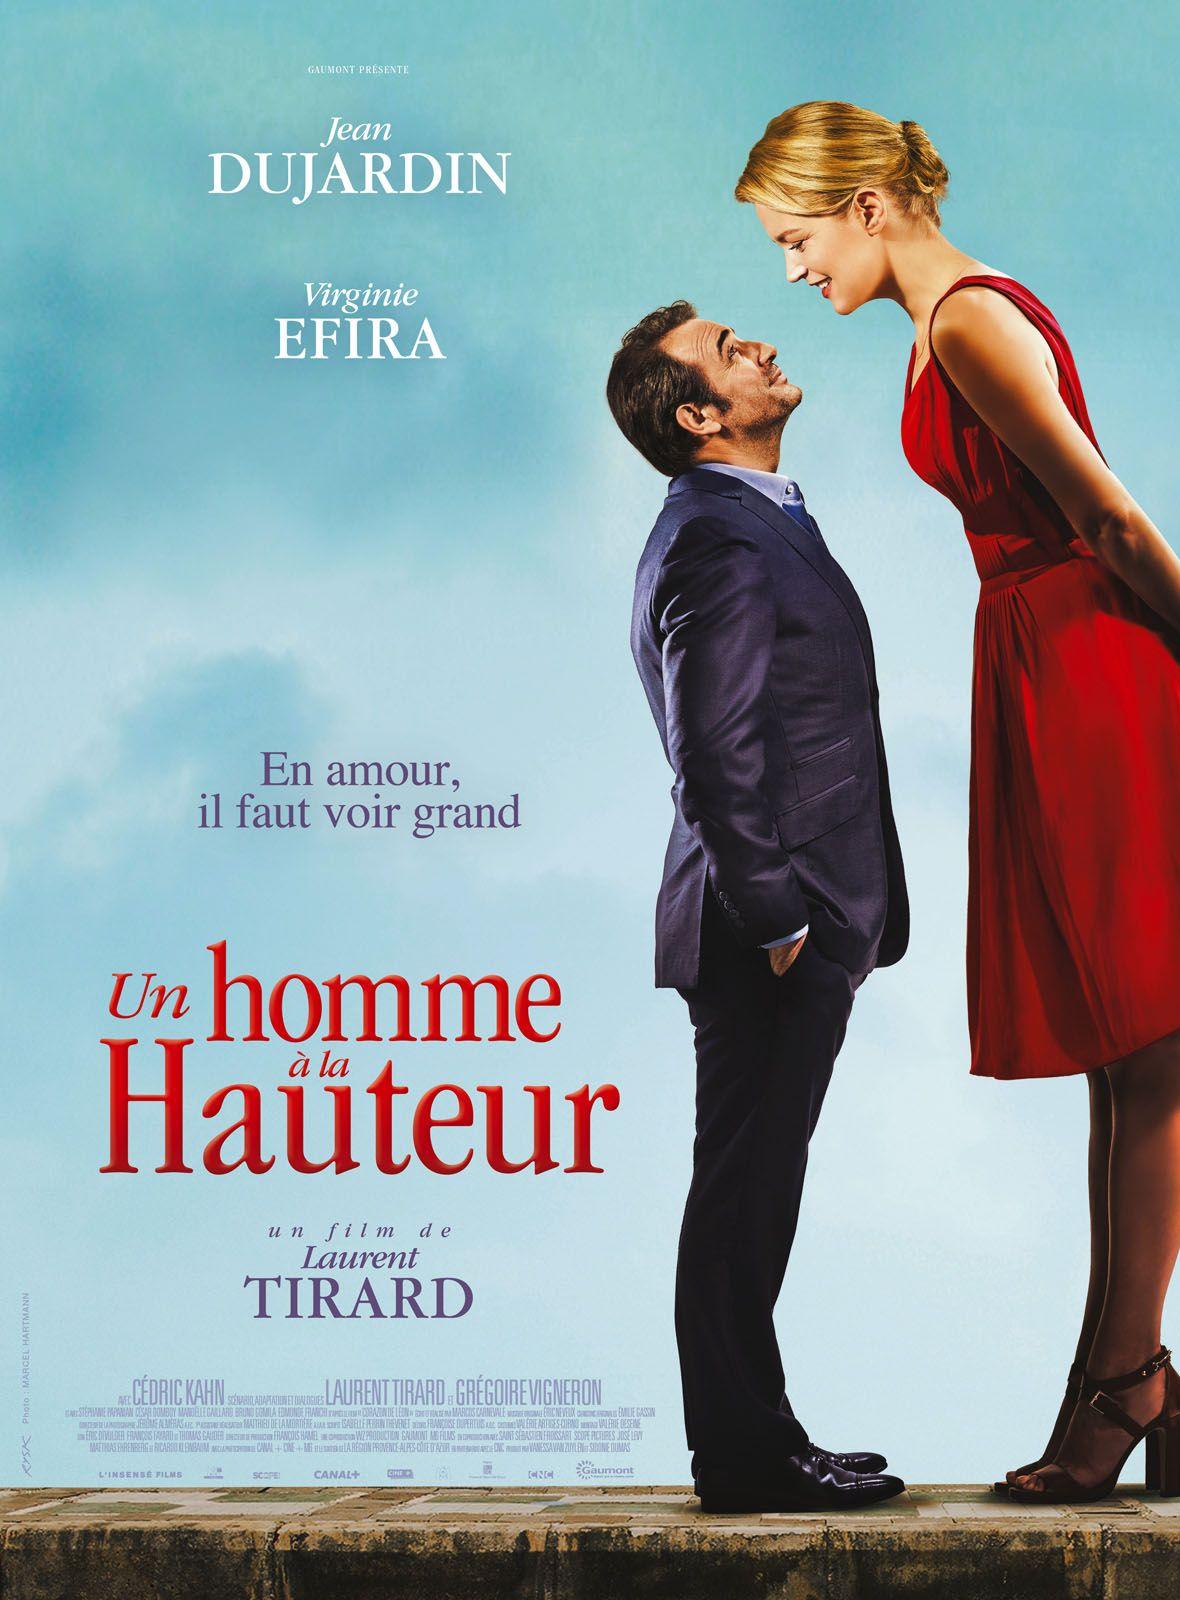 Un Homme A La Hauteur De Laurent Tirard 2015 Virginie Efira Jean Dujardin Film